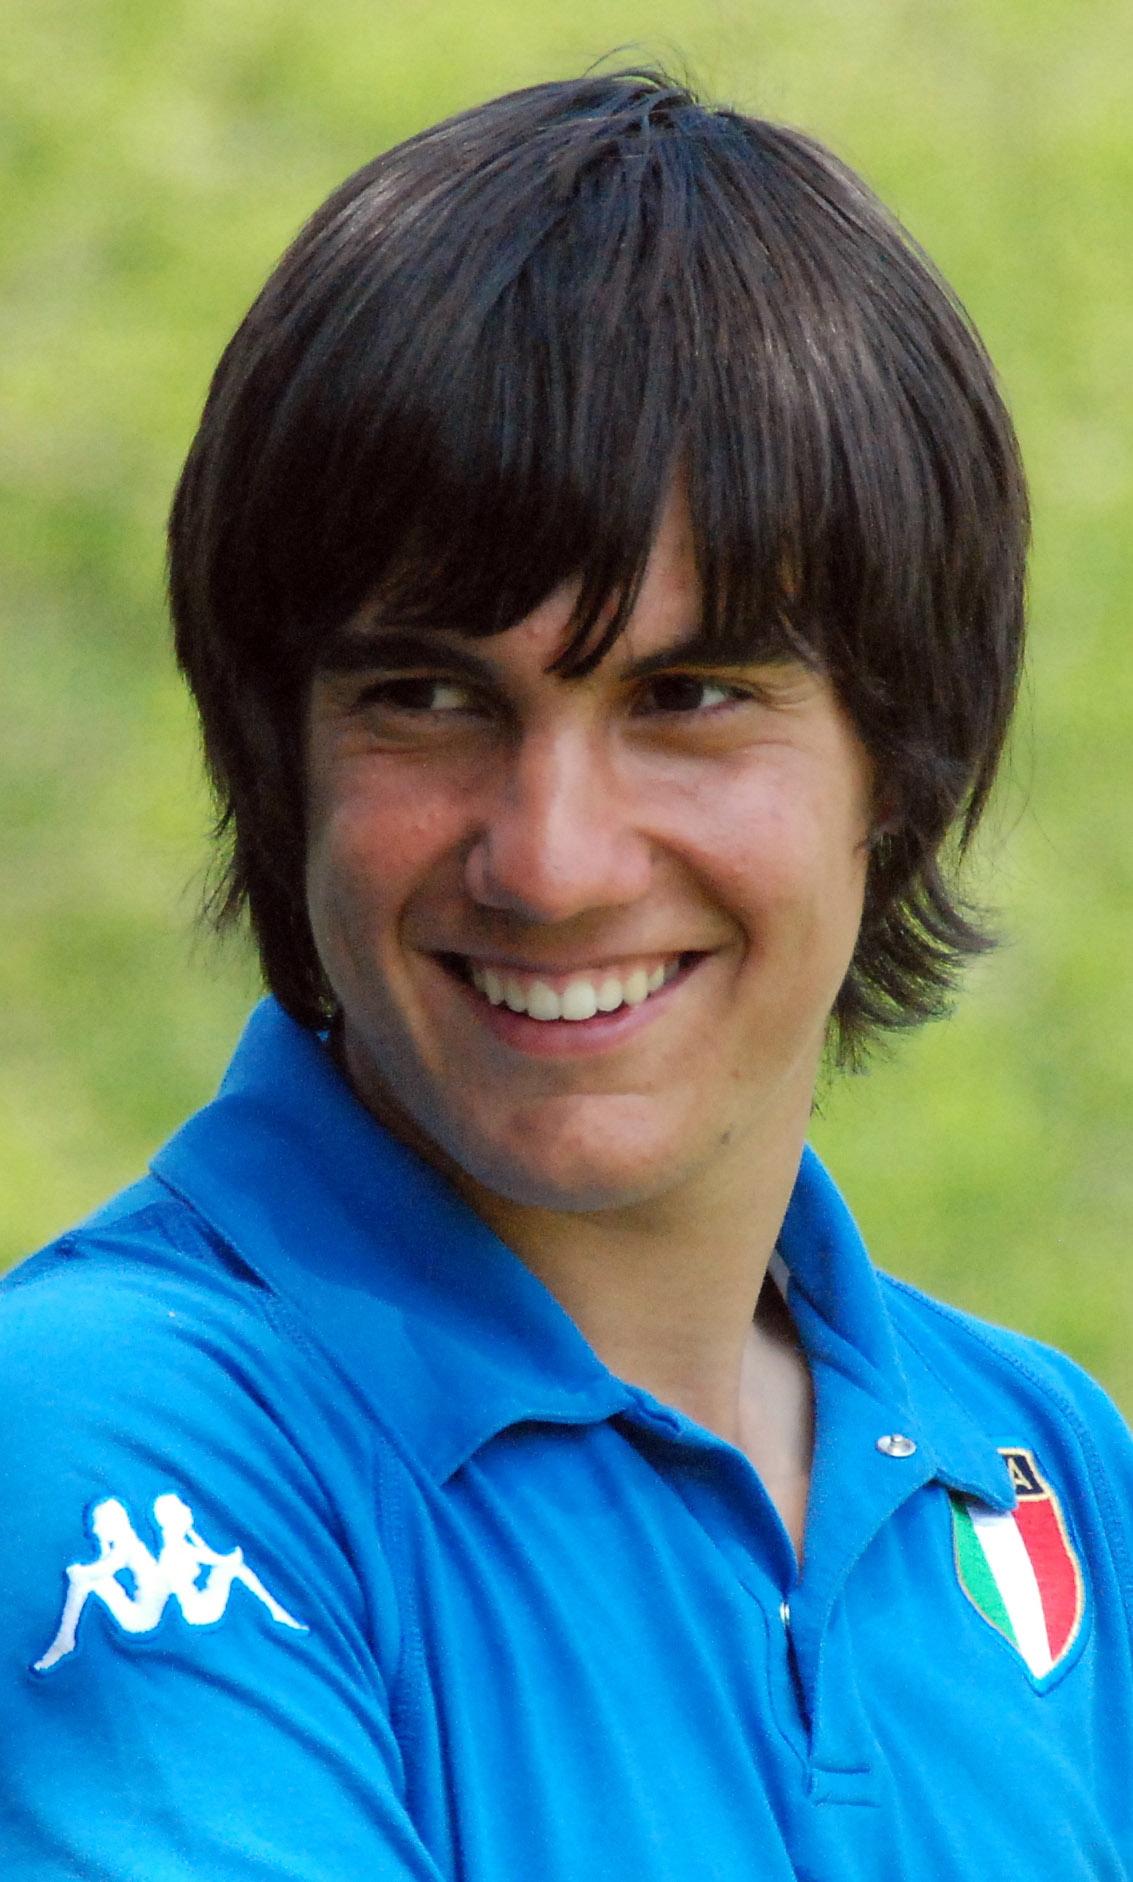 Matteo Manassero - Amateur Championship 2009